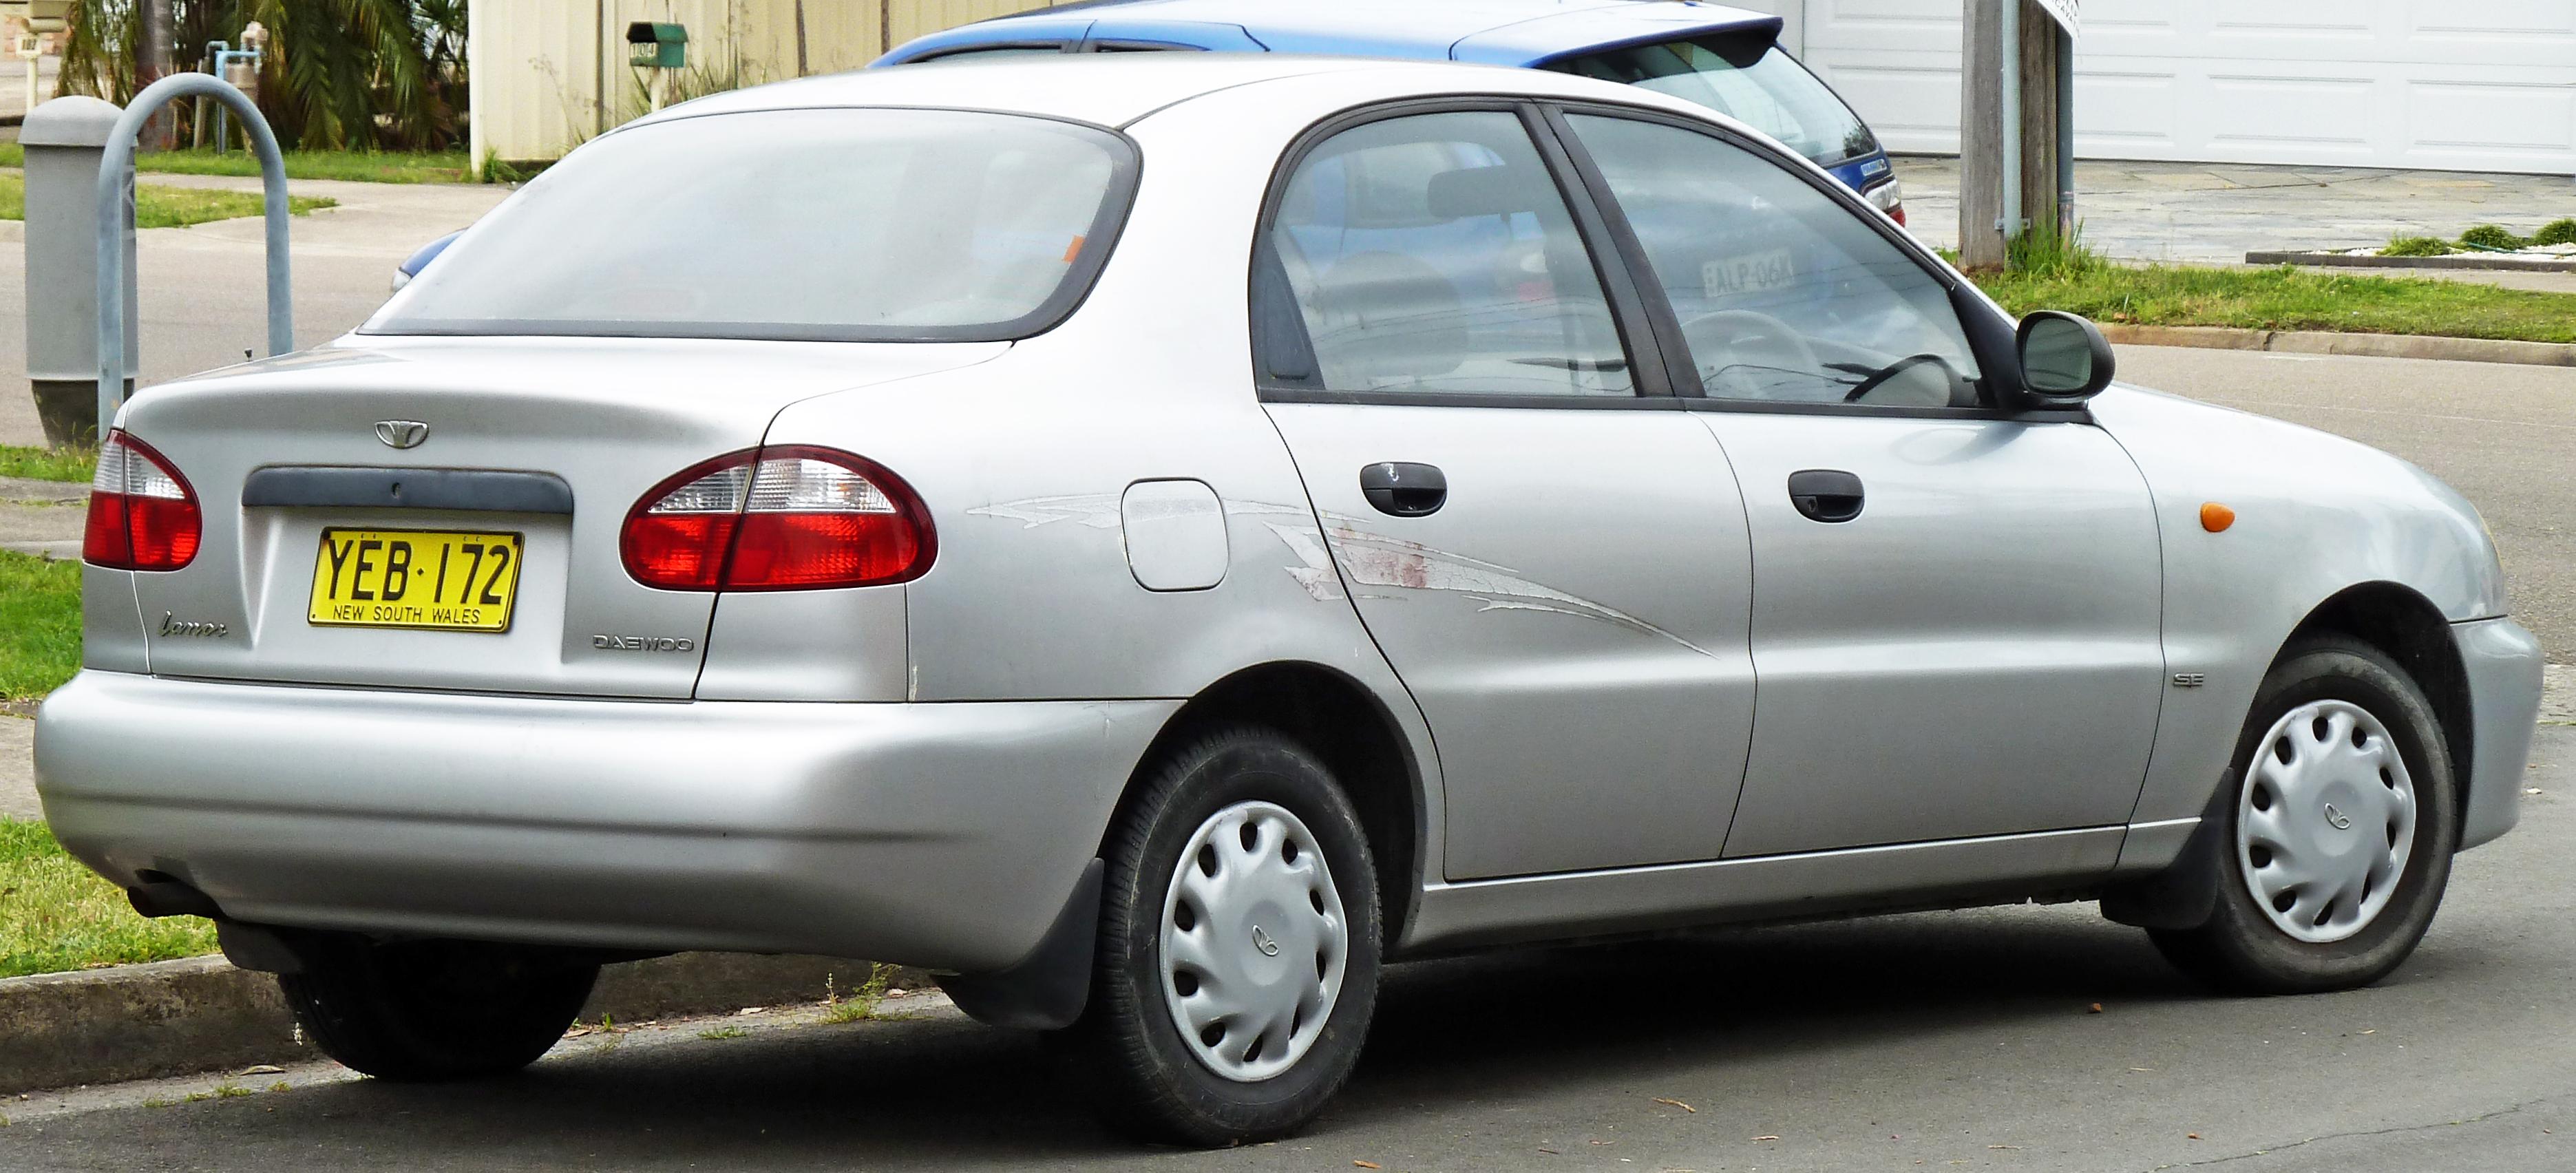 Car Used Ukraine